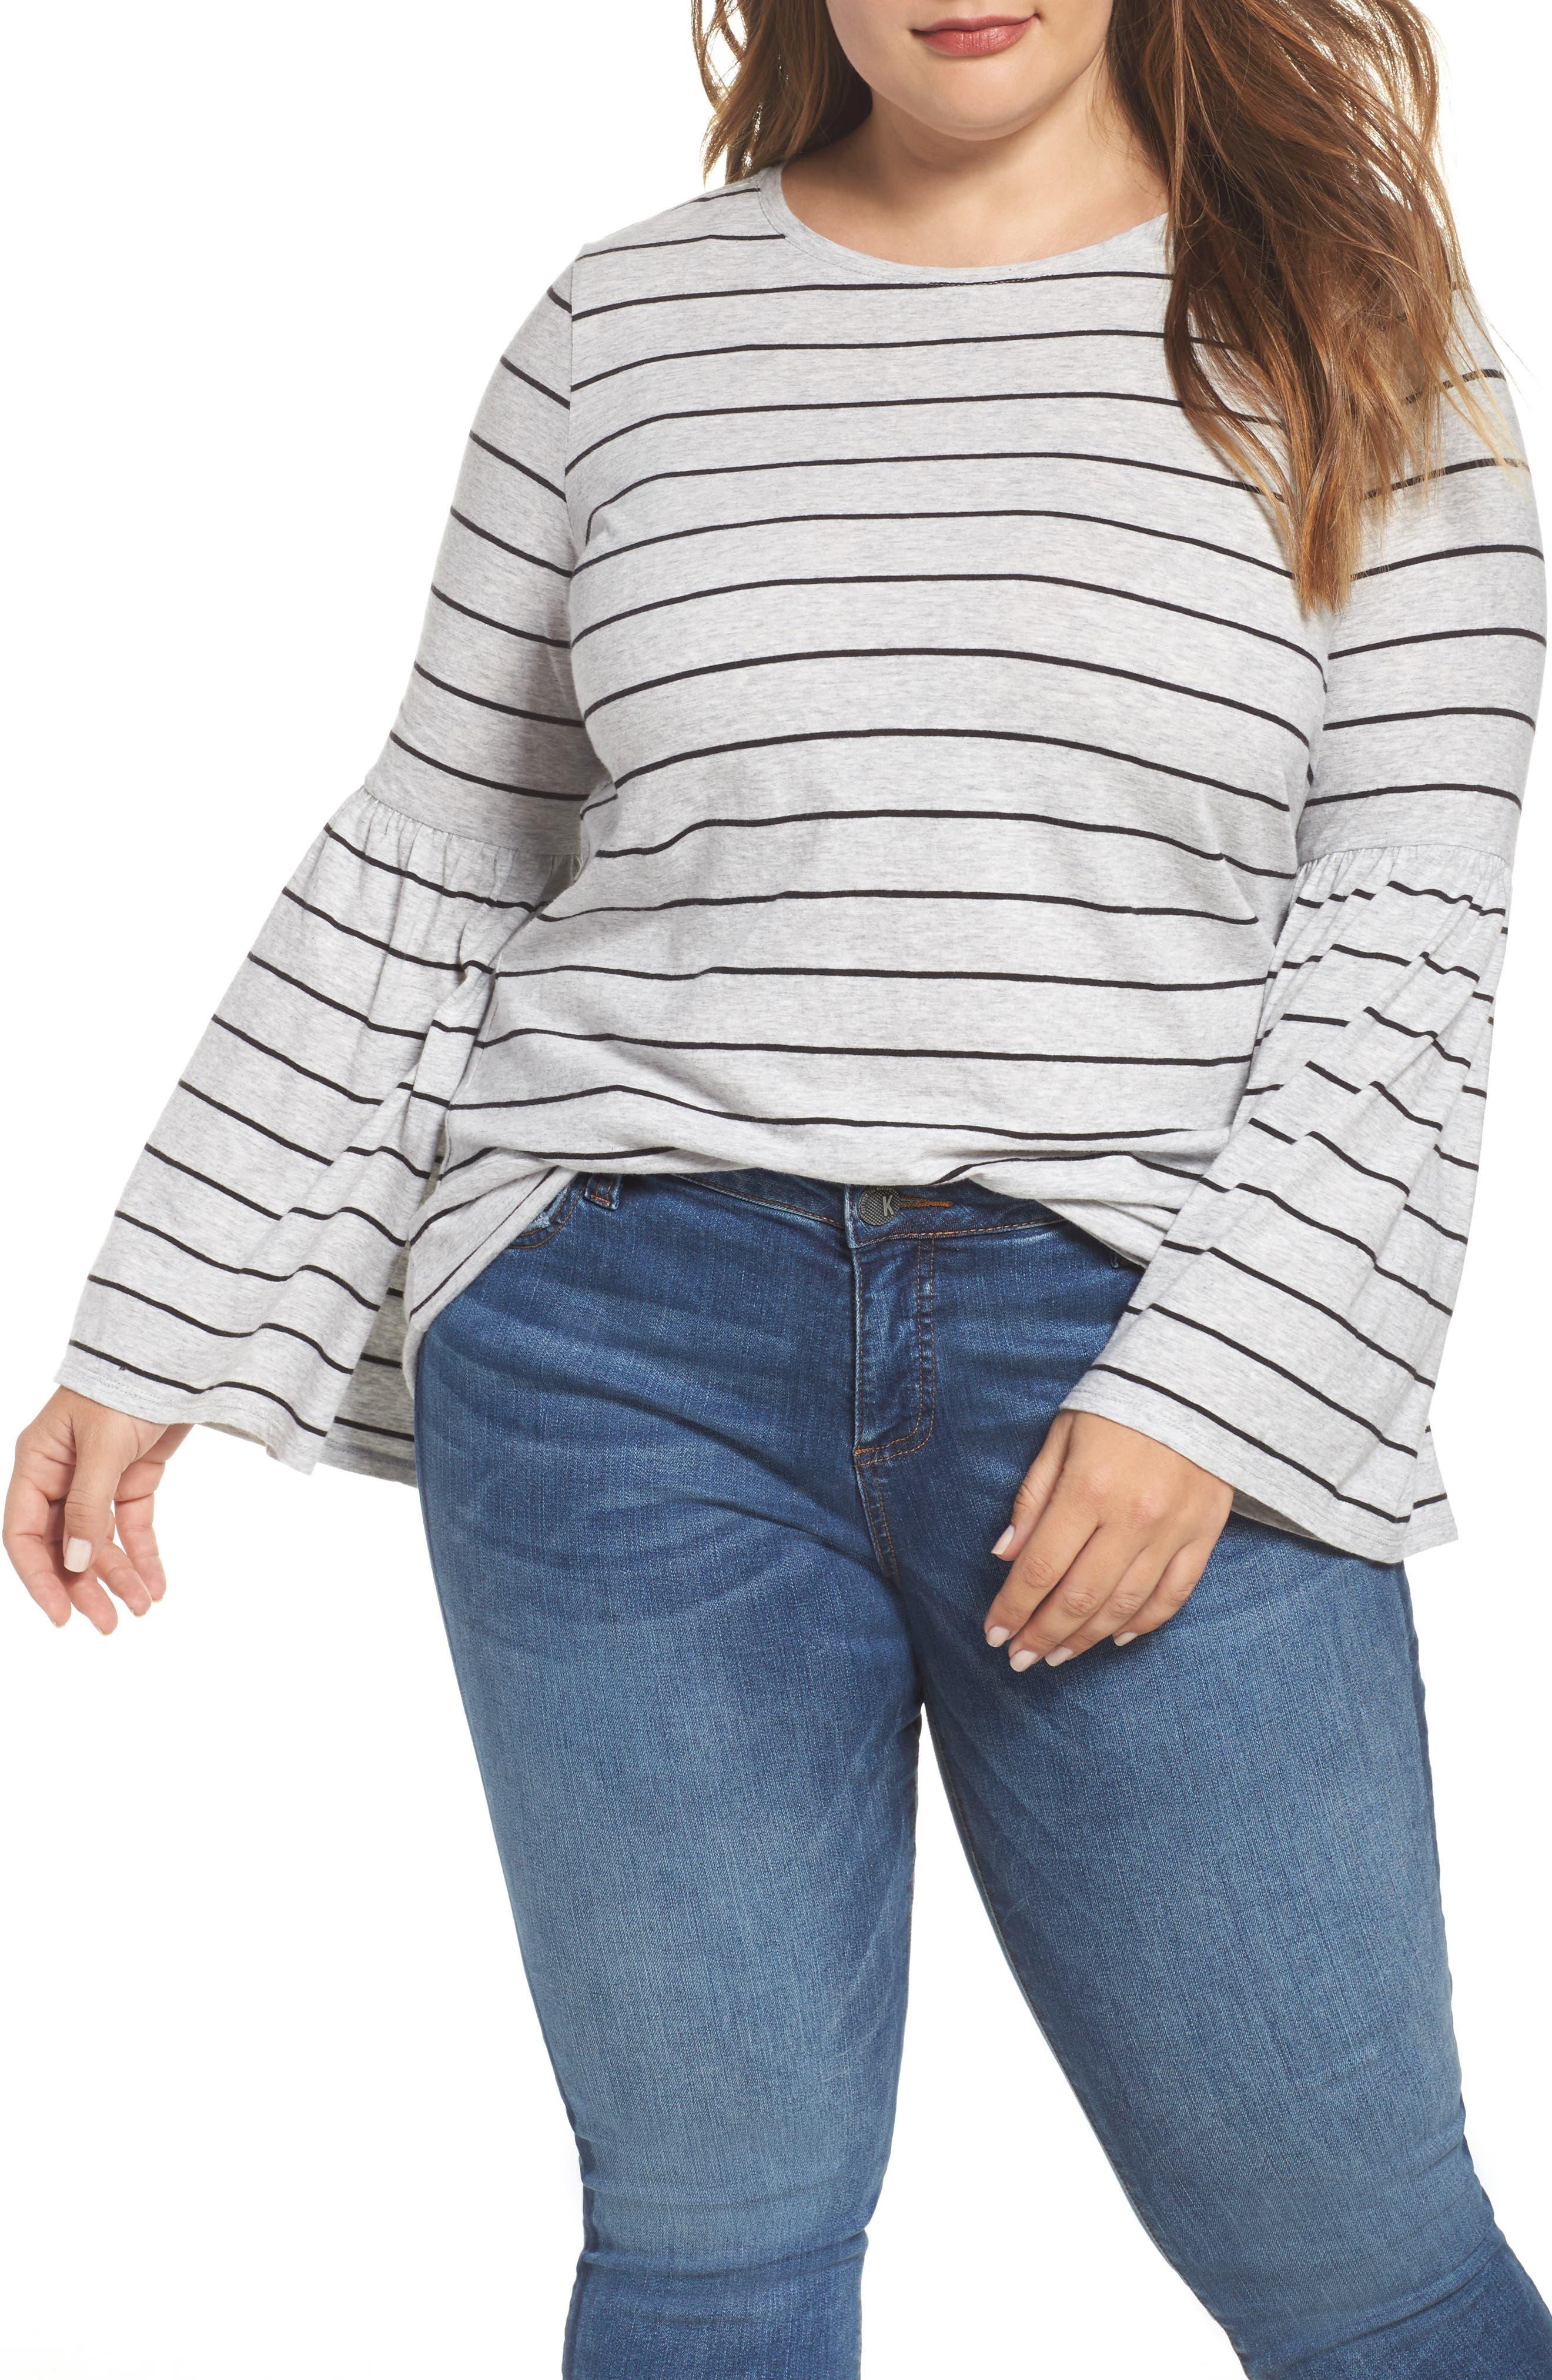 Nova Stripe Bell Sleeve Top,                         Main,                         color, Smoke Heather